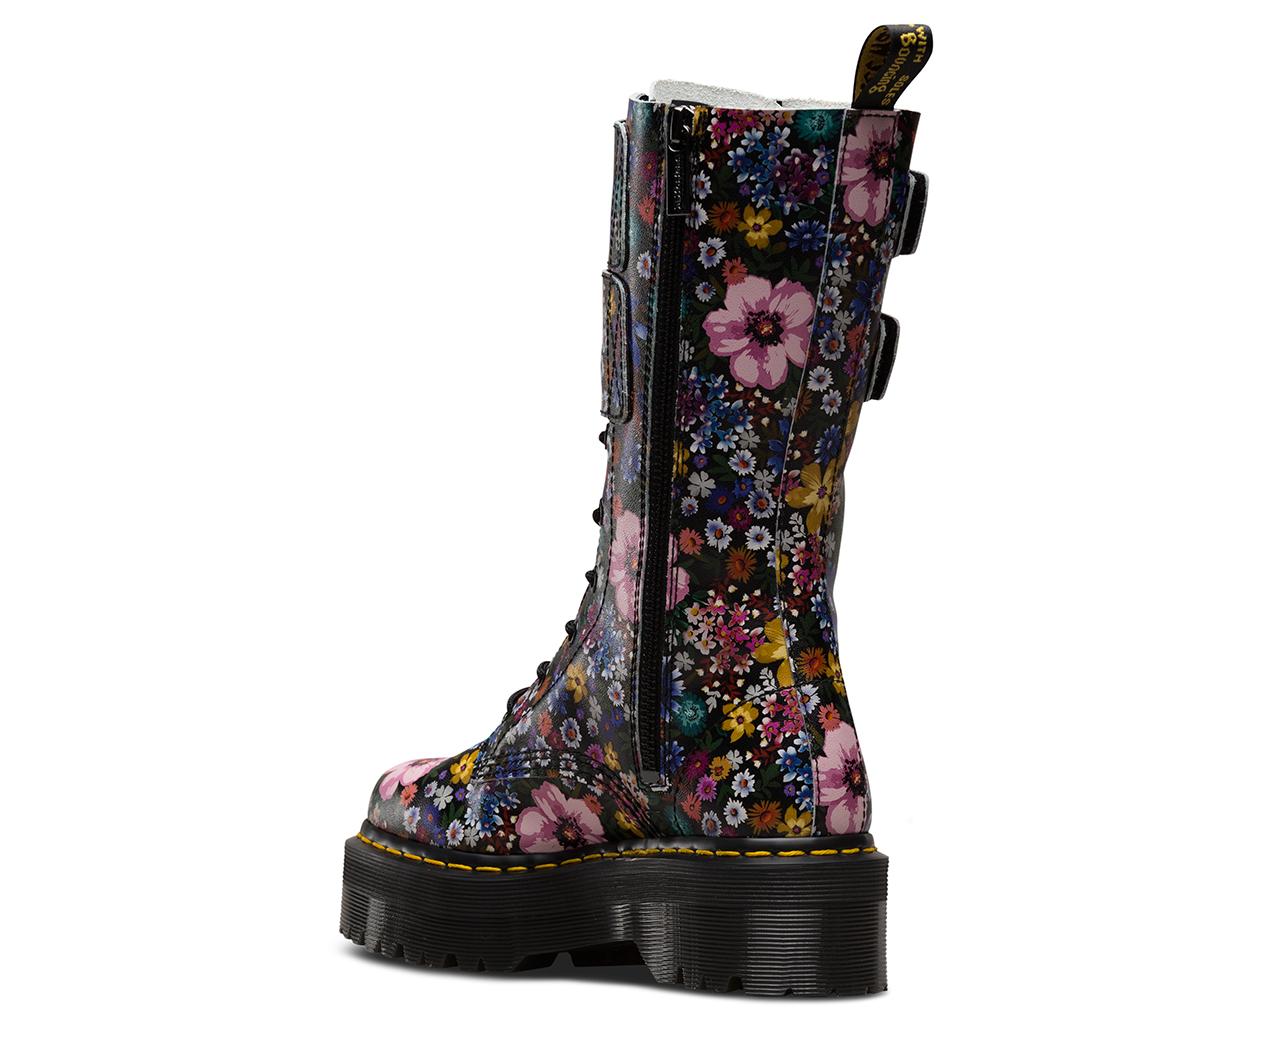 Boots Femme Pour Wanderlust Martens Fr Dr Jagger The Store Official vqgFWp1